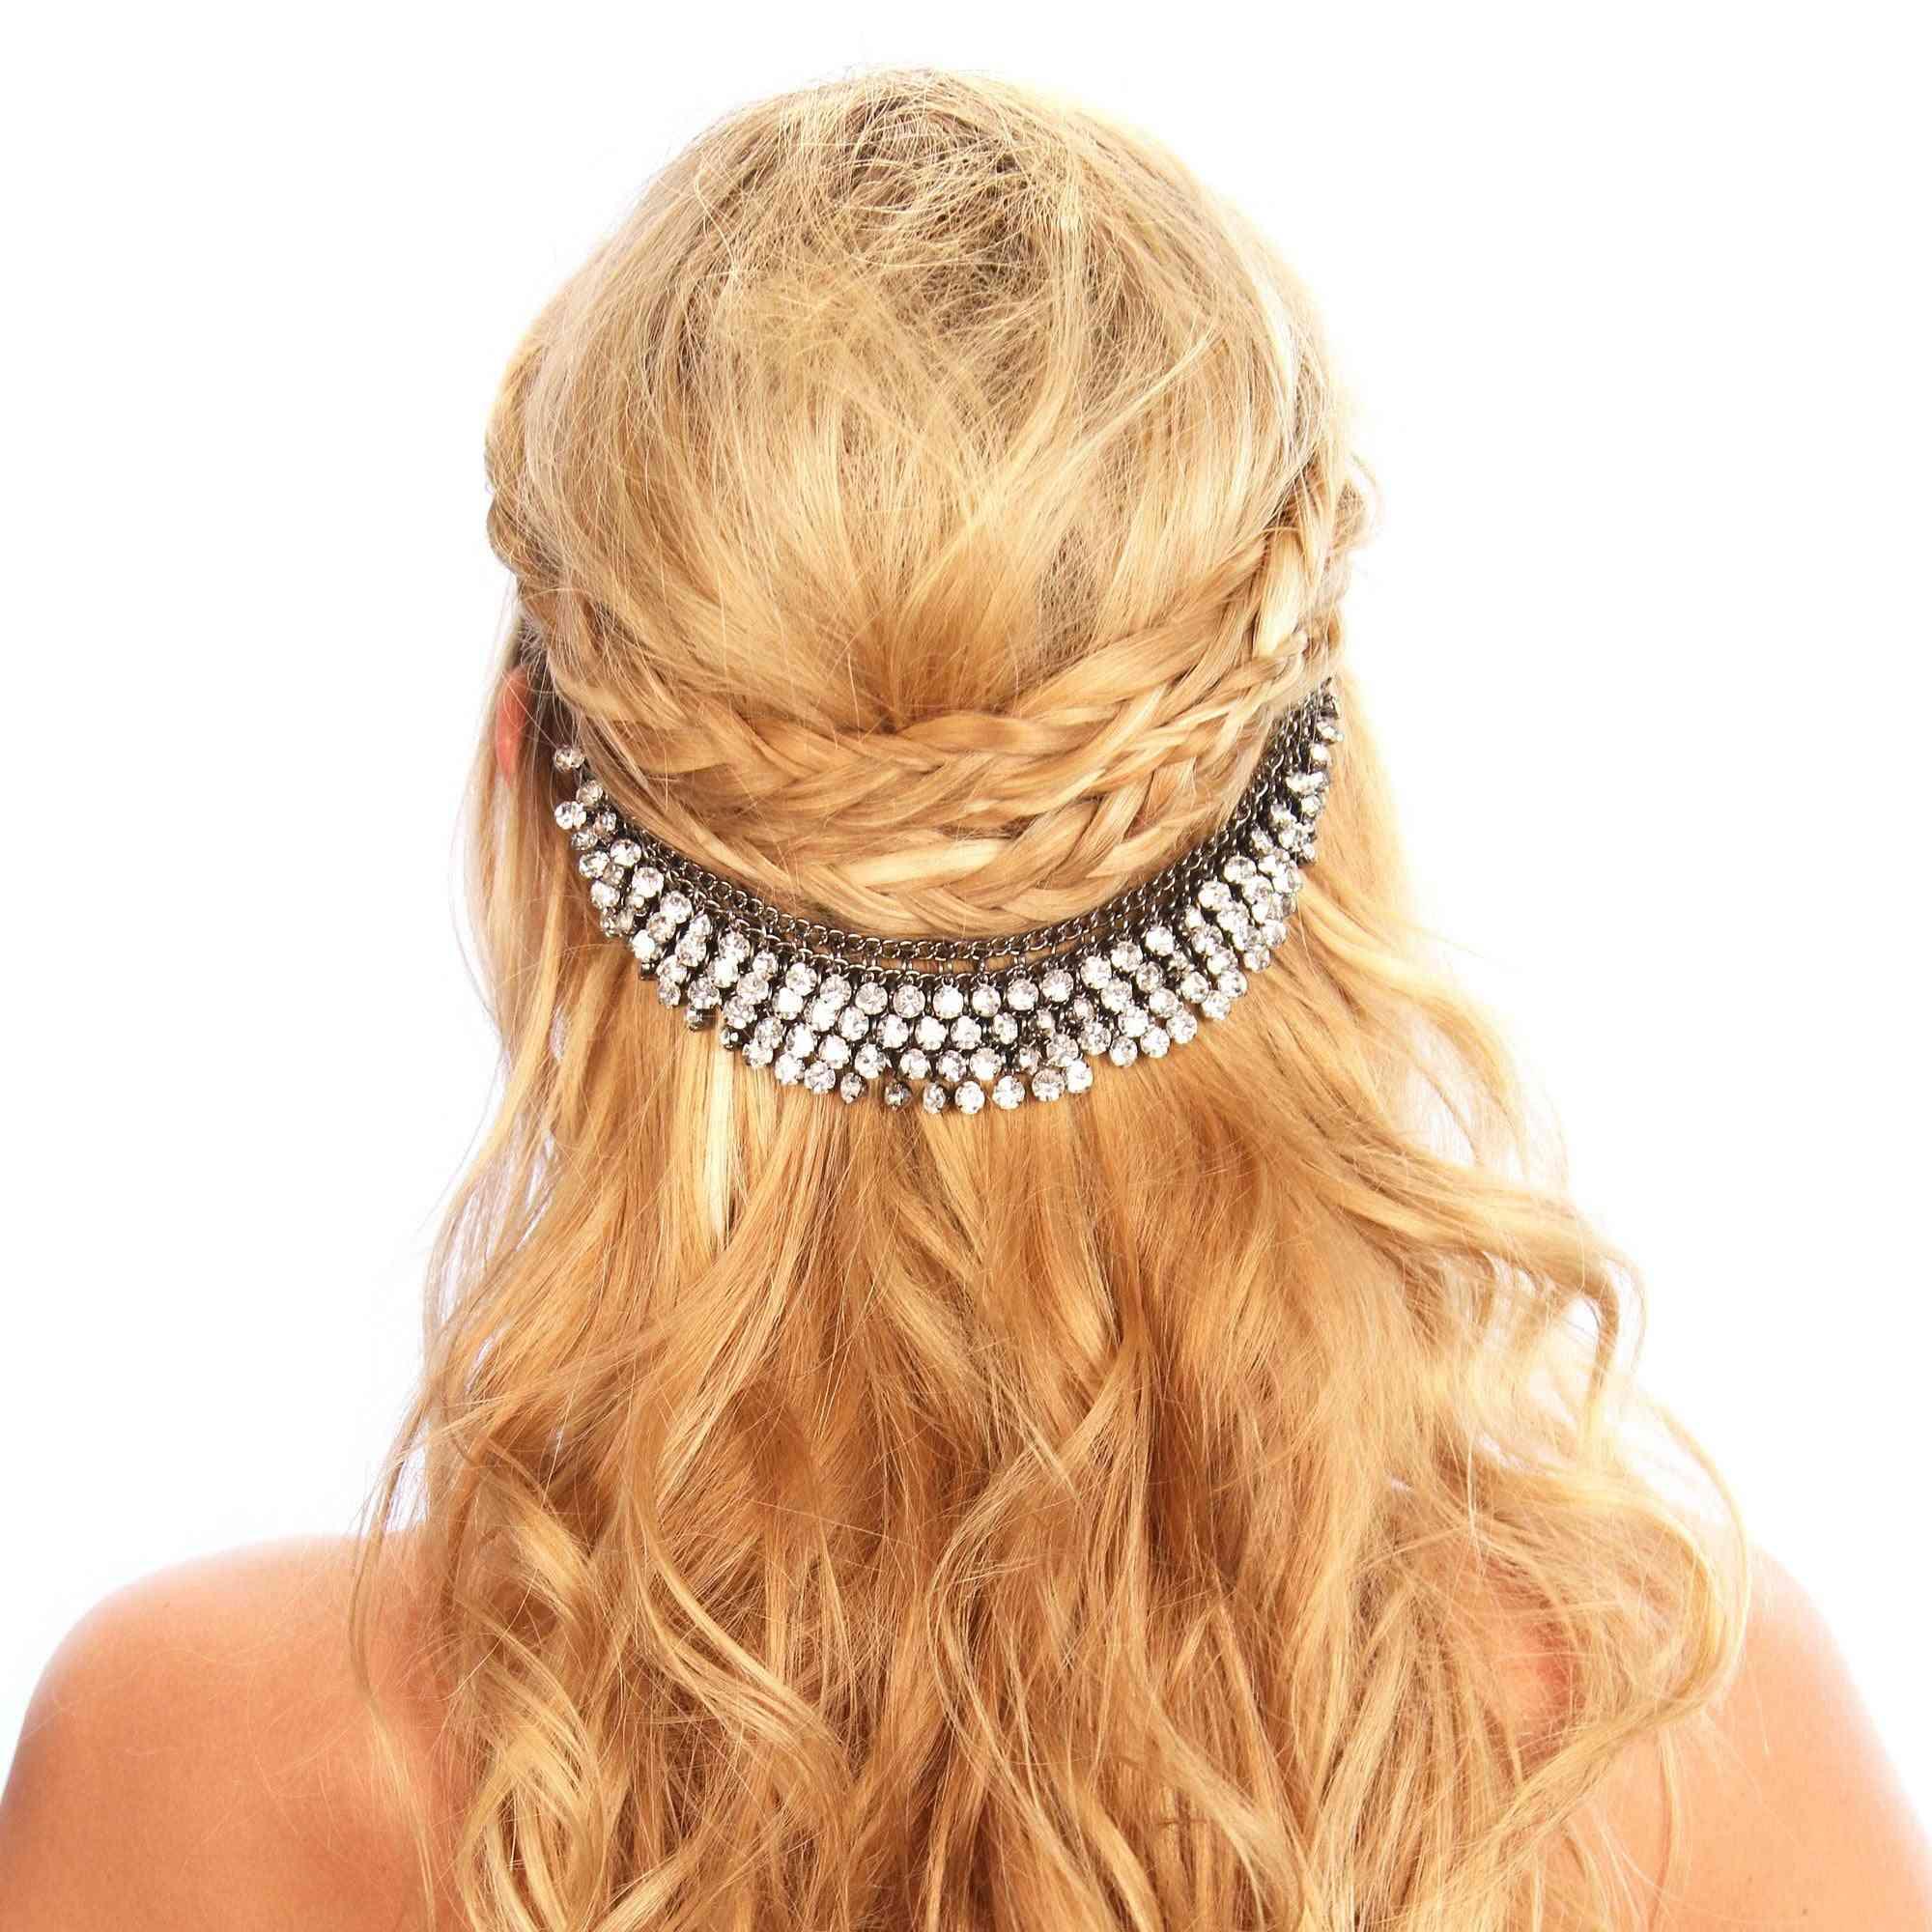 Sparkling Rhinestones Hair Grip